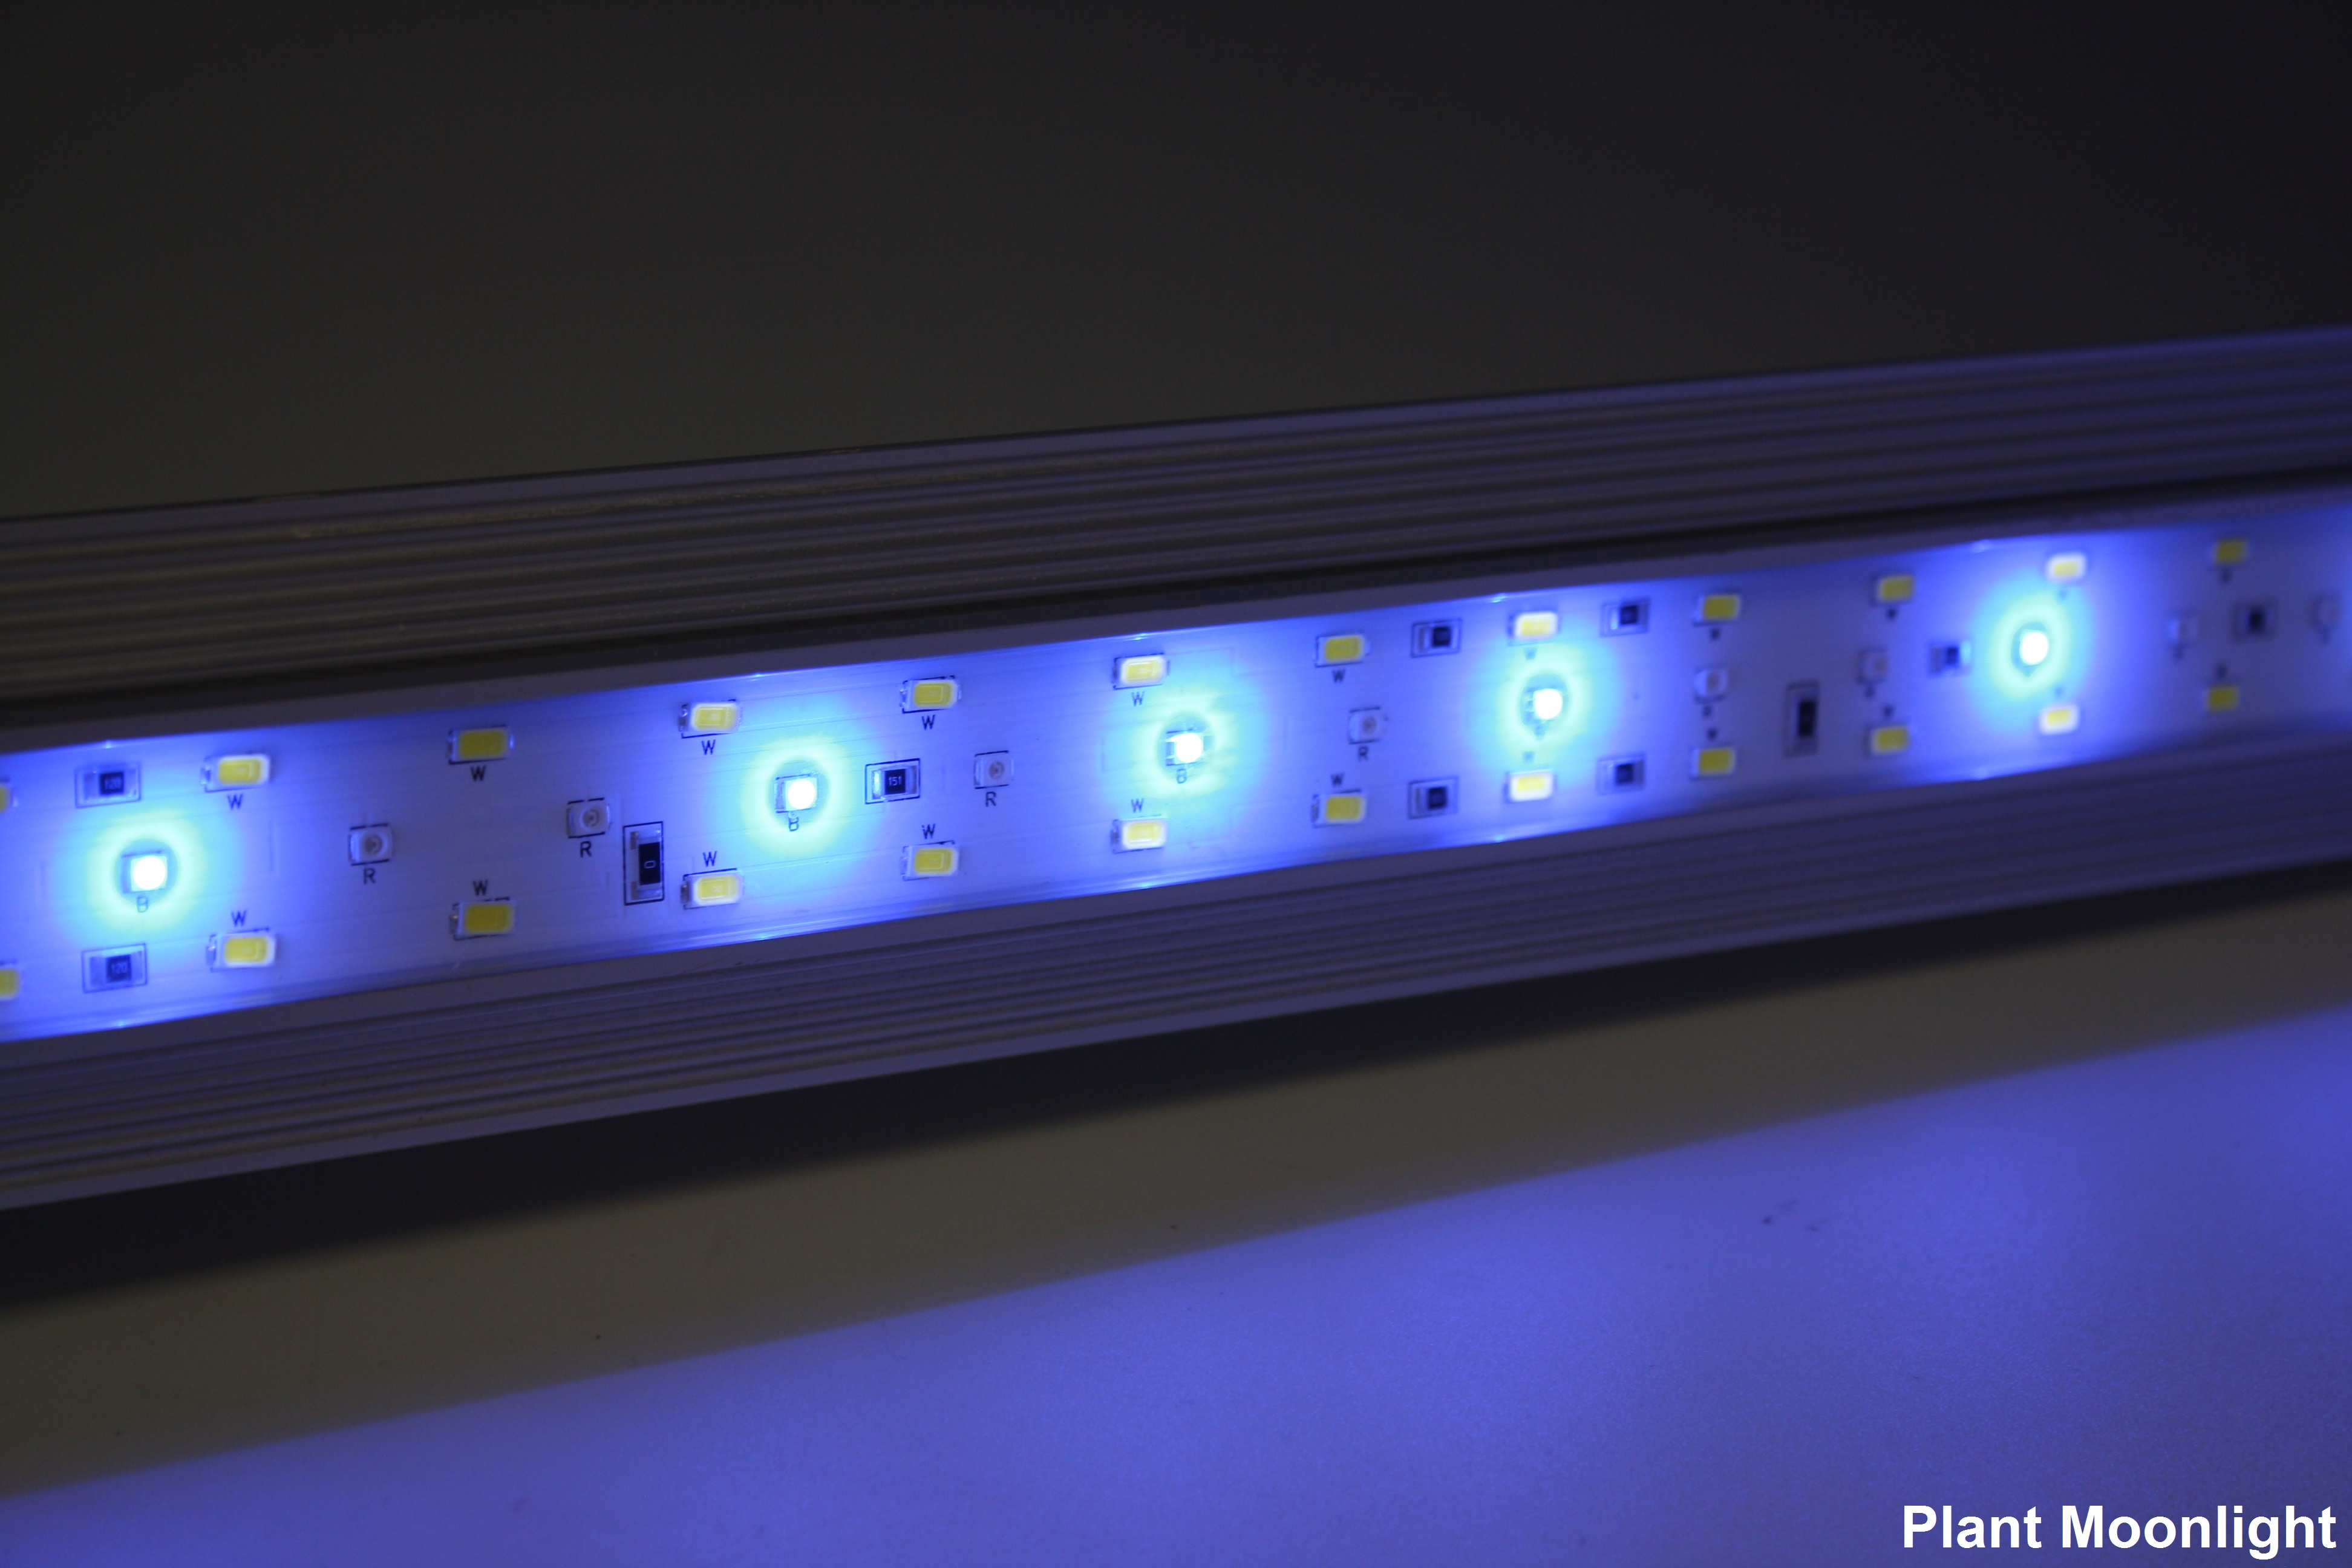 Zetlight Lancia ZP-4000-742 LED Waterproof Aquarium Light, 30-35in Plant Gallery